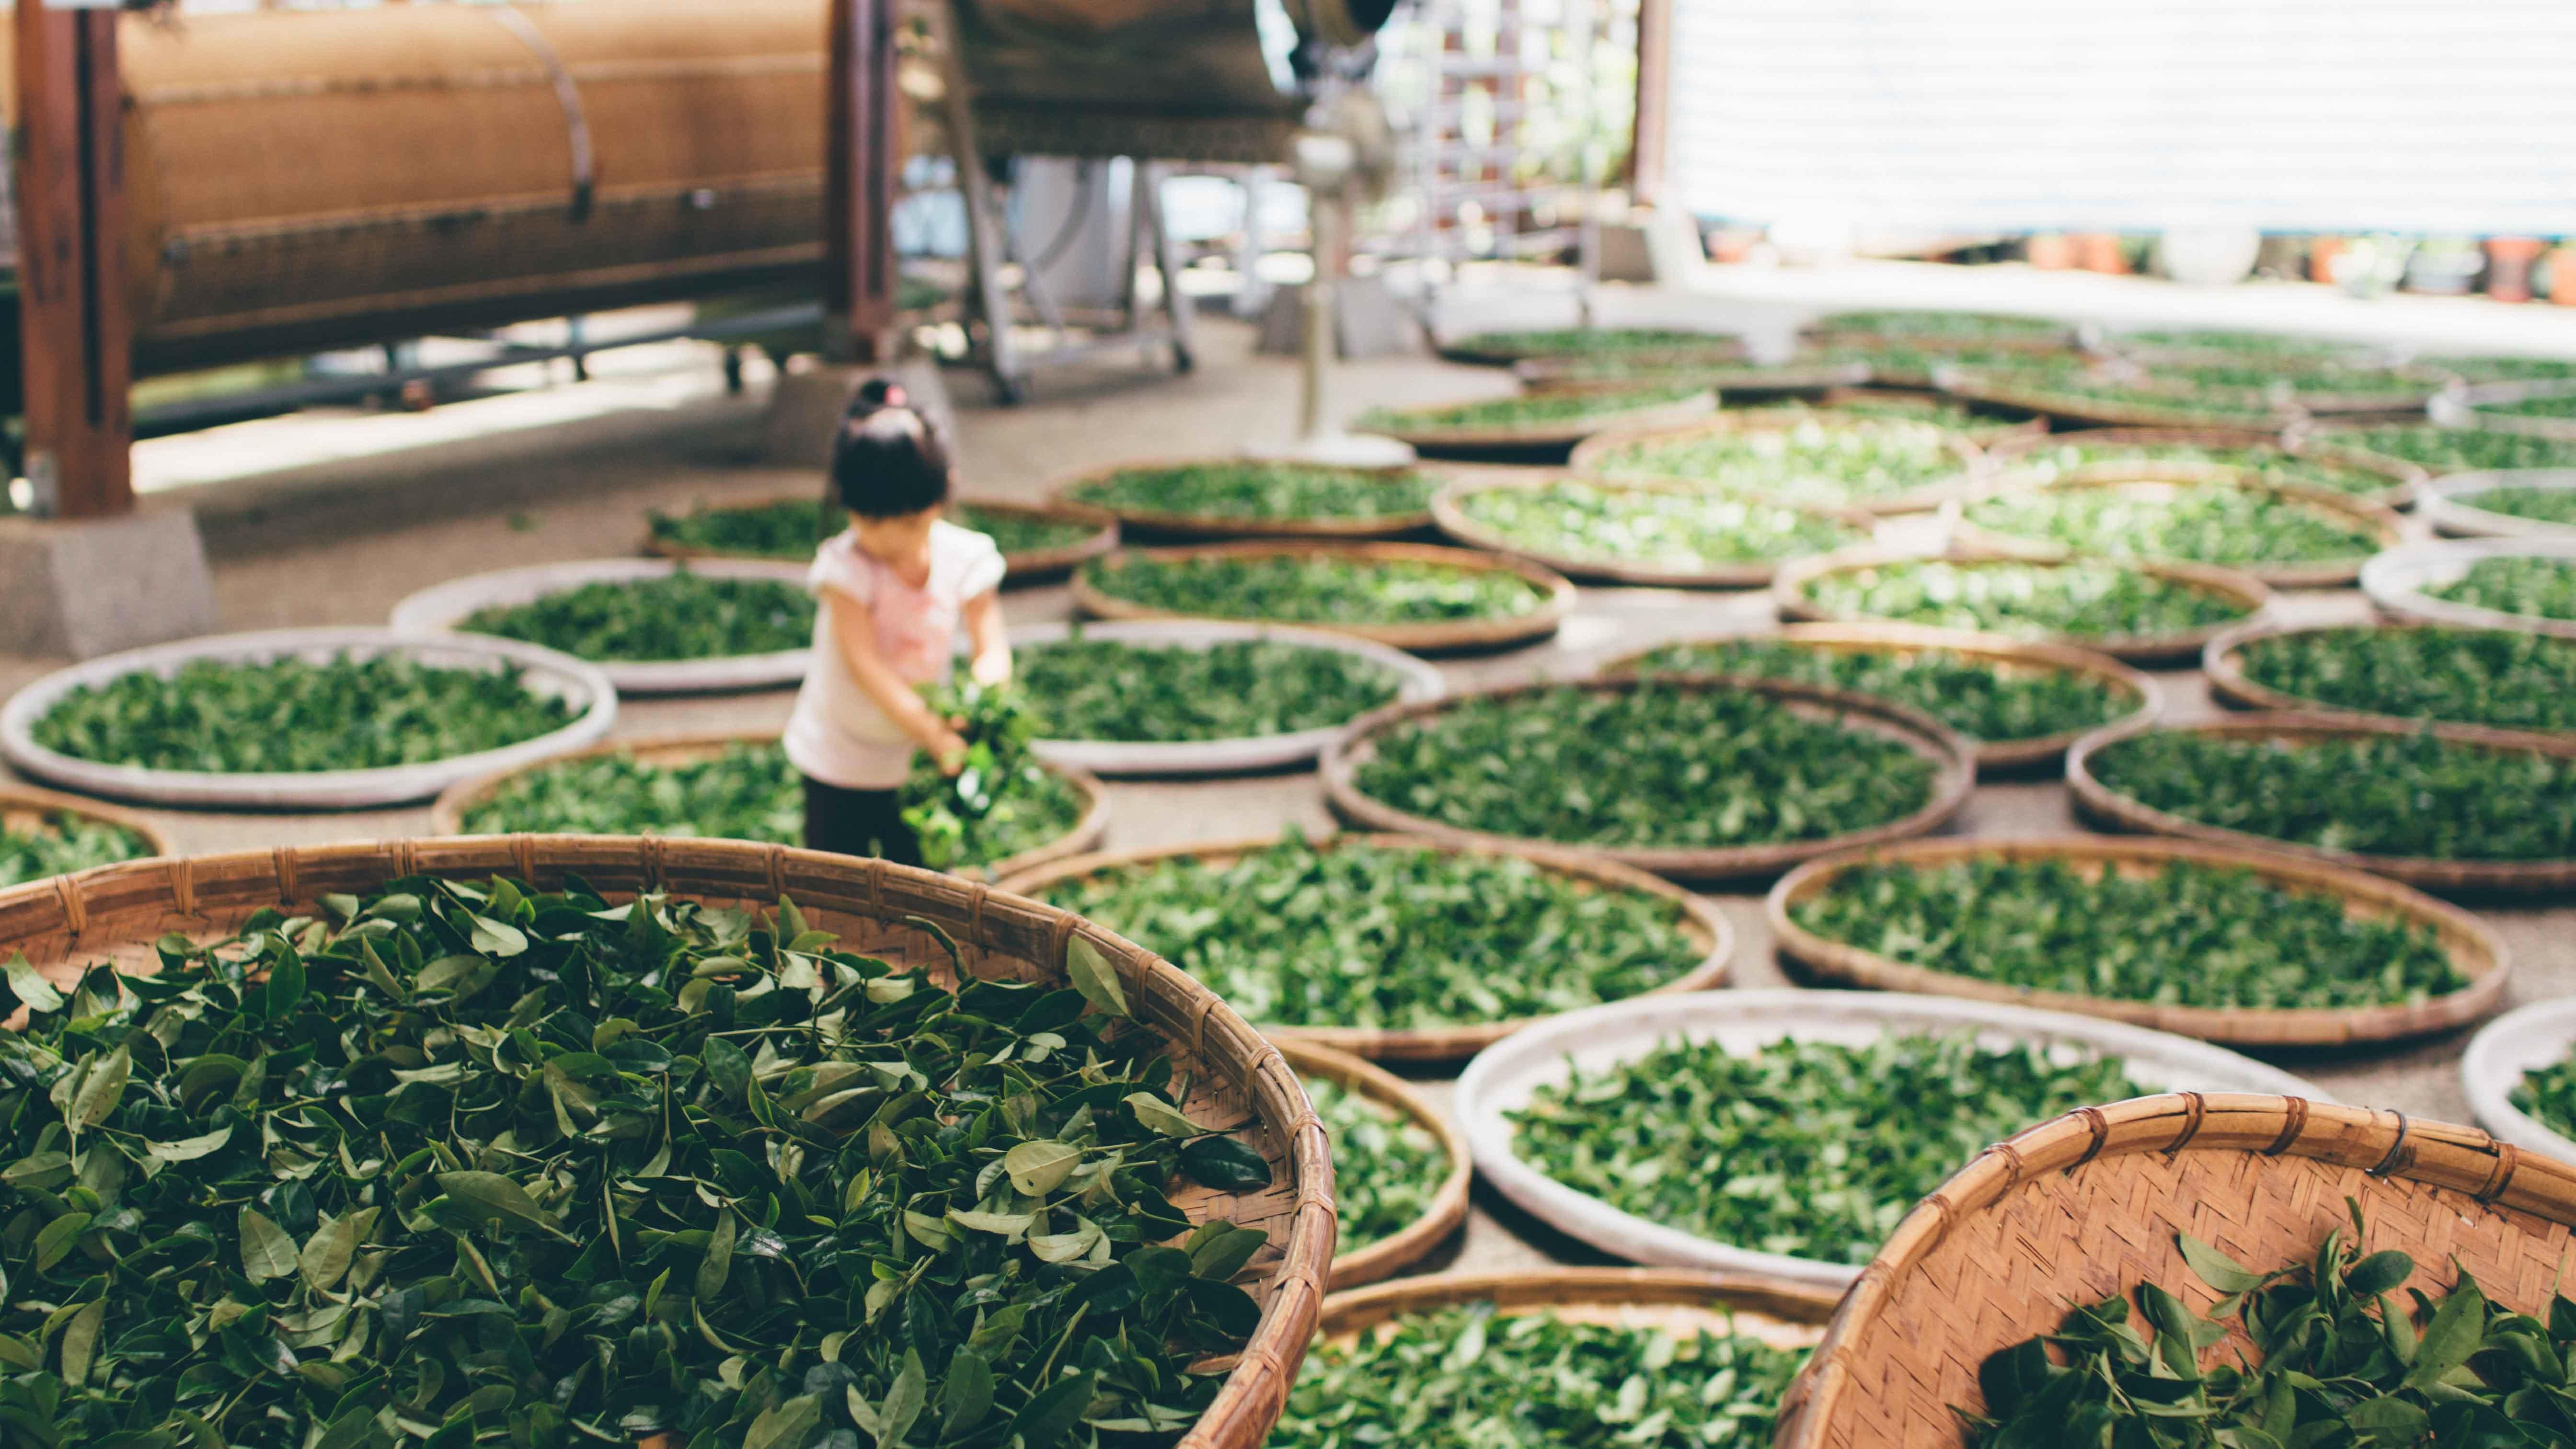 Work Tea Food Harvest Produce Vegetable Backyard Soil Asia Child Garden Public Domain Images